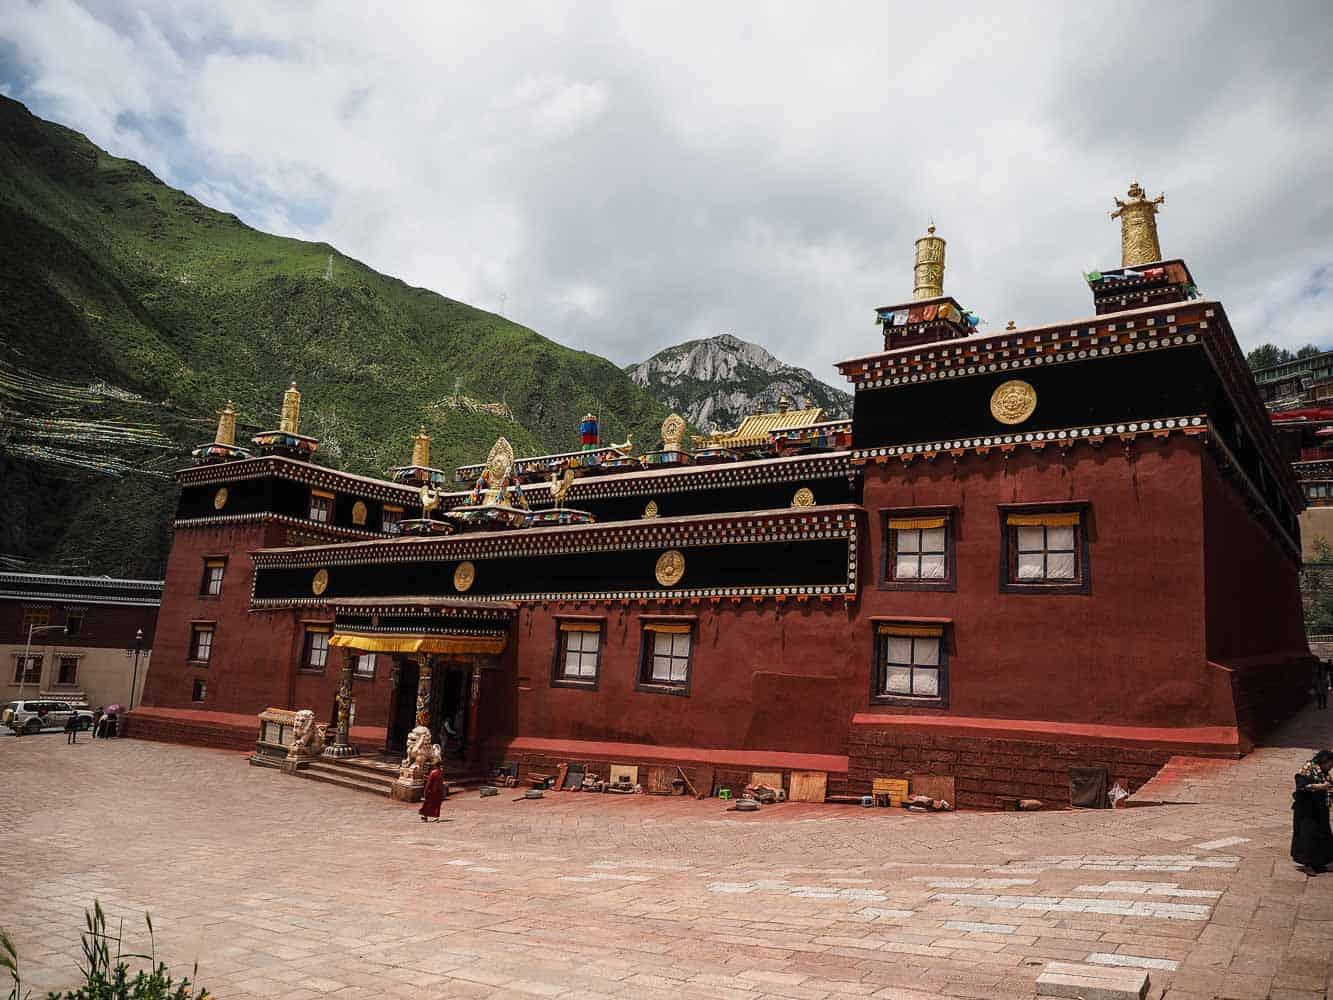 Dege Bakong Scripture Printing Press in western Sichuan